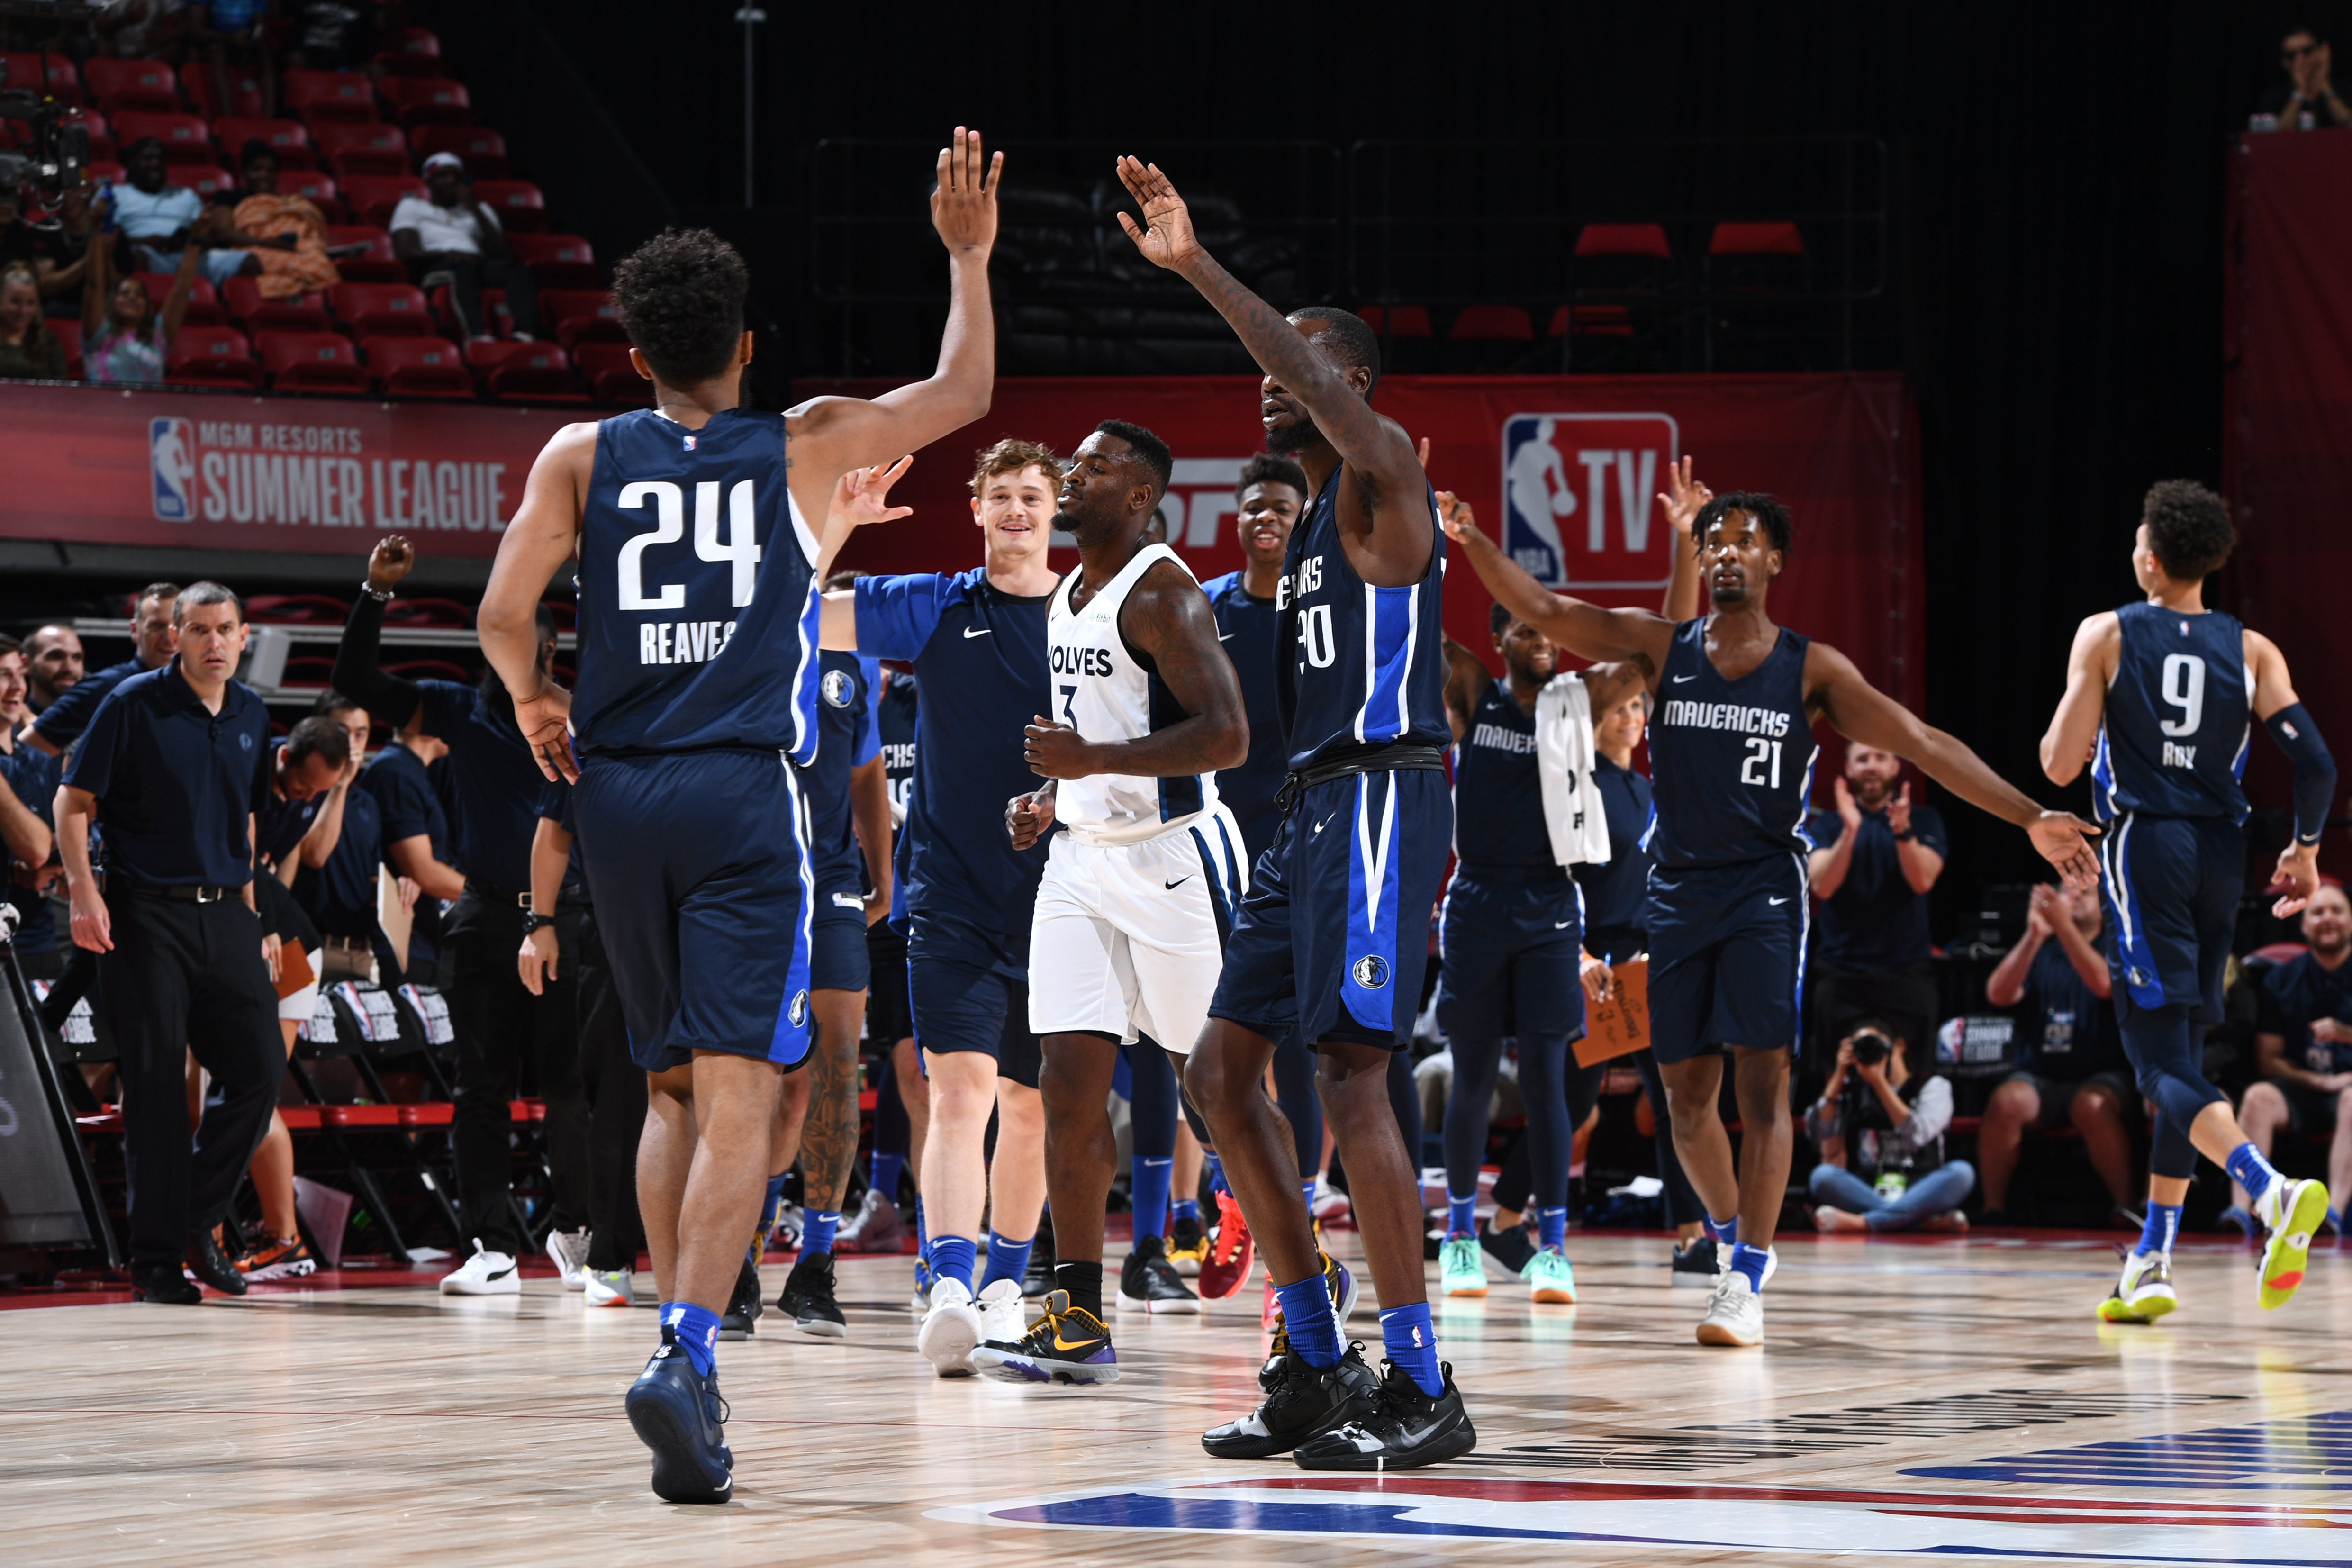 2019 Las Vegas Summer League - Day 9 - Dallas Mavericks v Minnesota Timberwolves